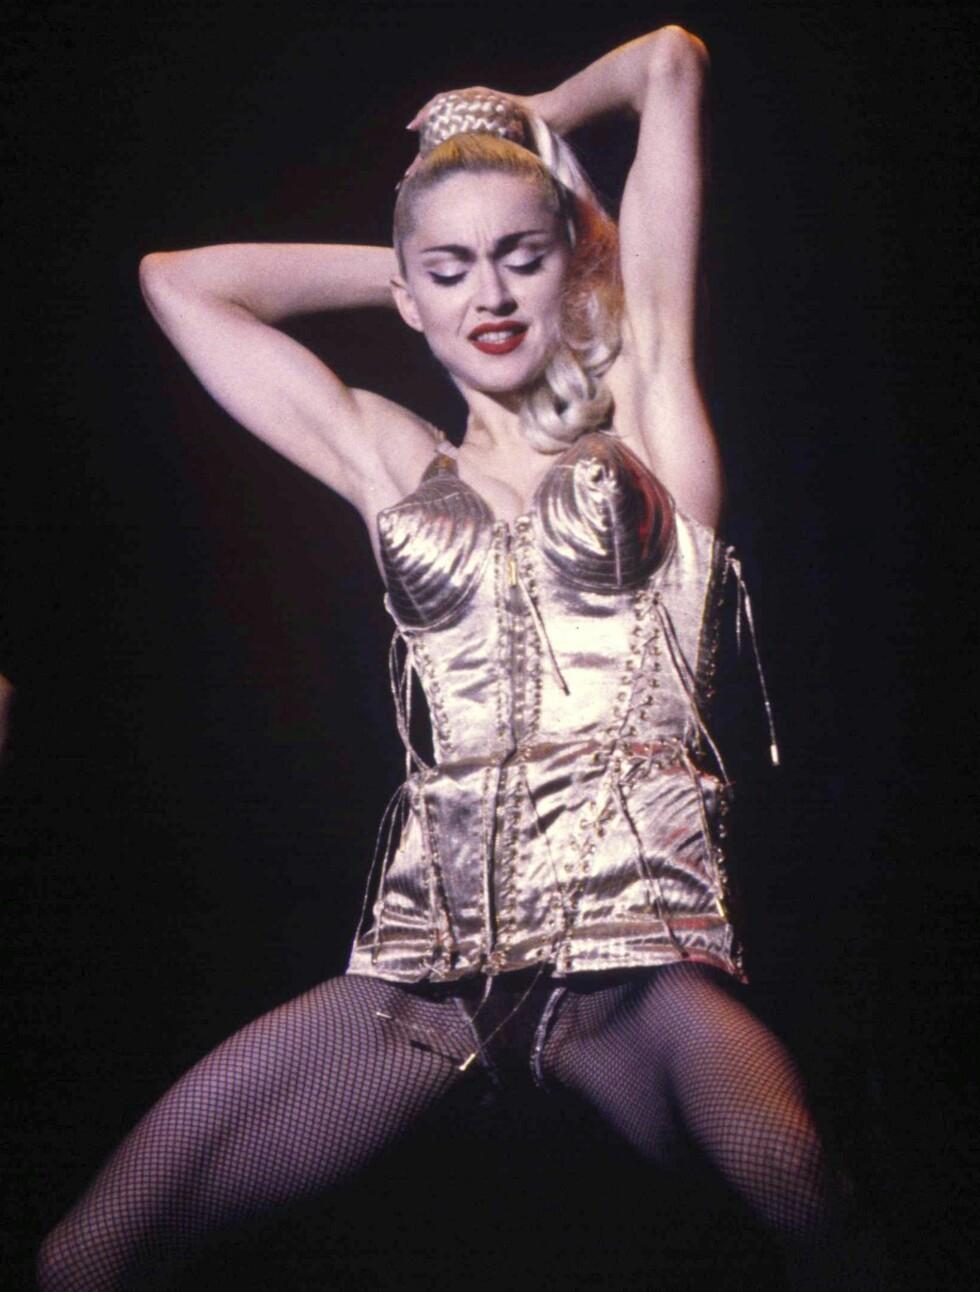 Madonna turnerte verden rundt i 1990 med sin «Blond Ambition World Tour». Her fikk fansen høre hits som «Like a Virgin», «Papa Don't Preach» og «Vogue».